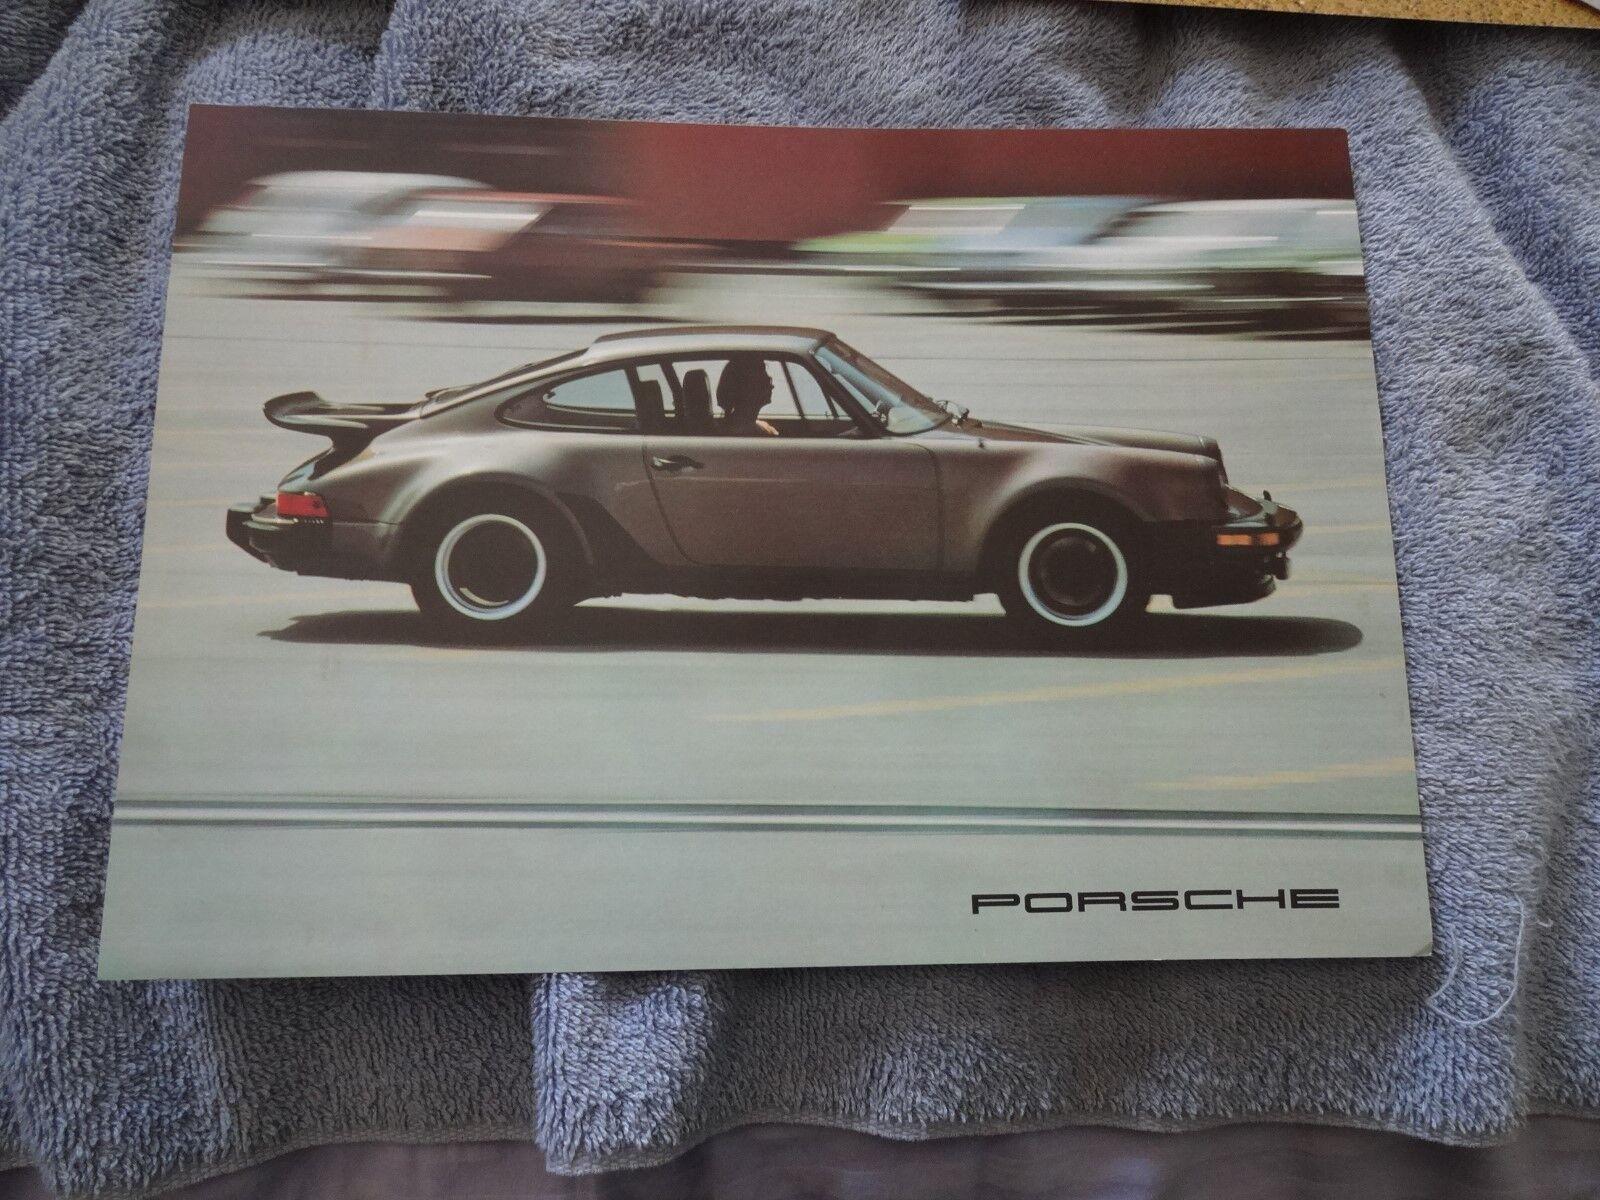 1976 Porsche 911 Turbo Carrera 912E  911S Factory Brochure oem xlnt